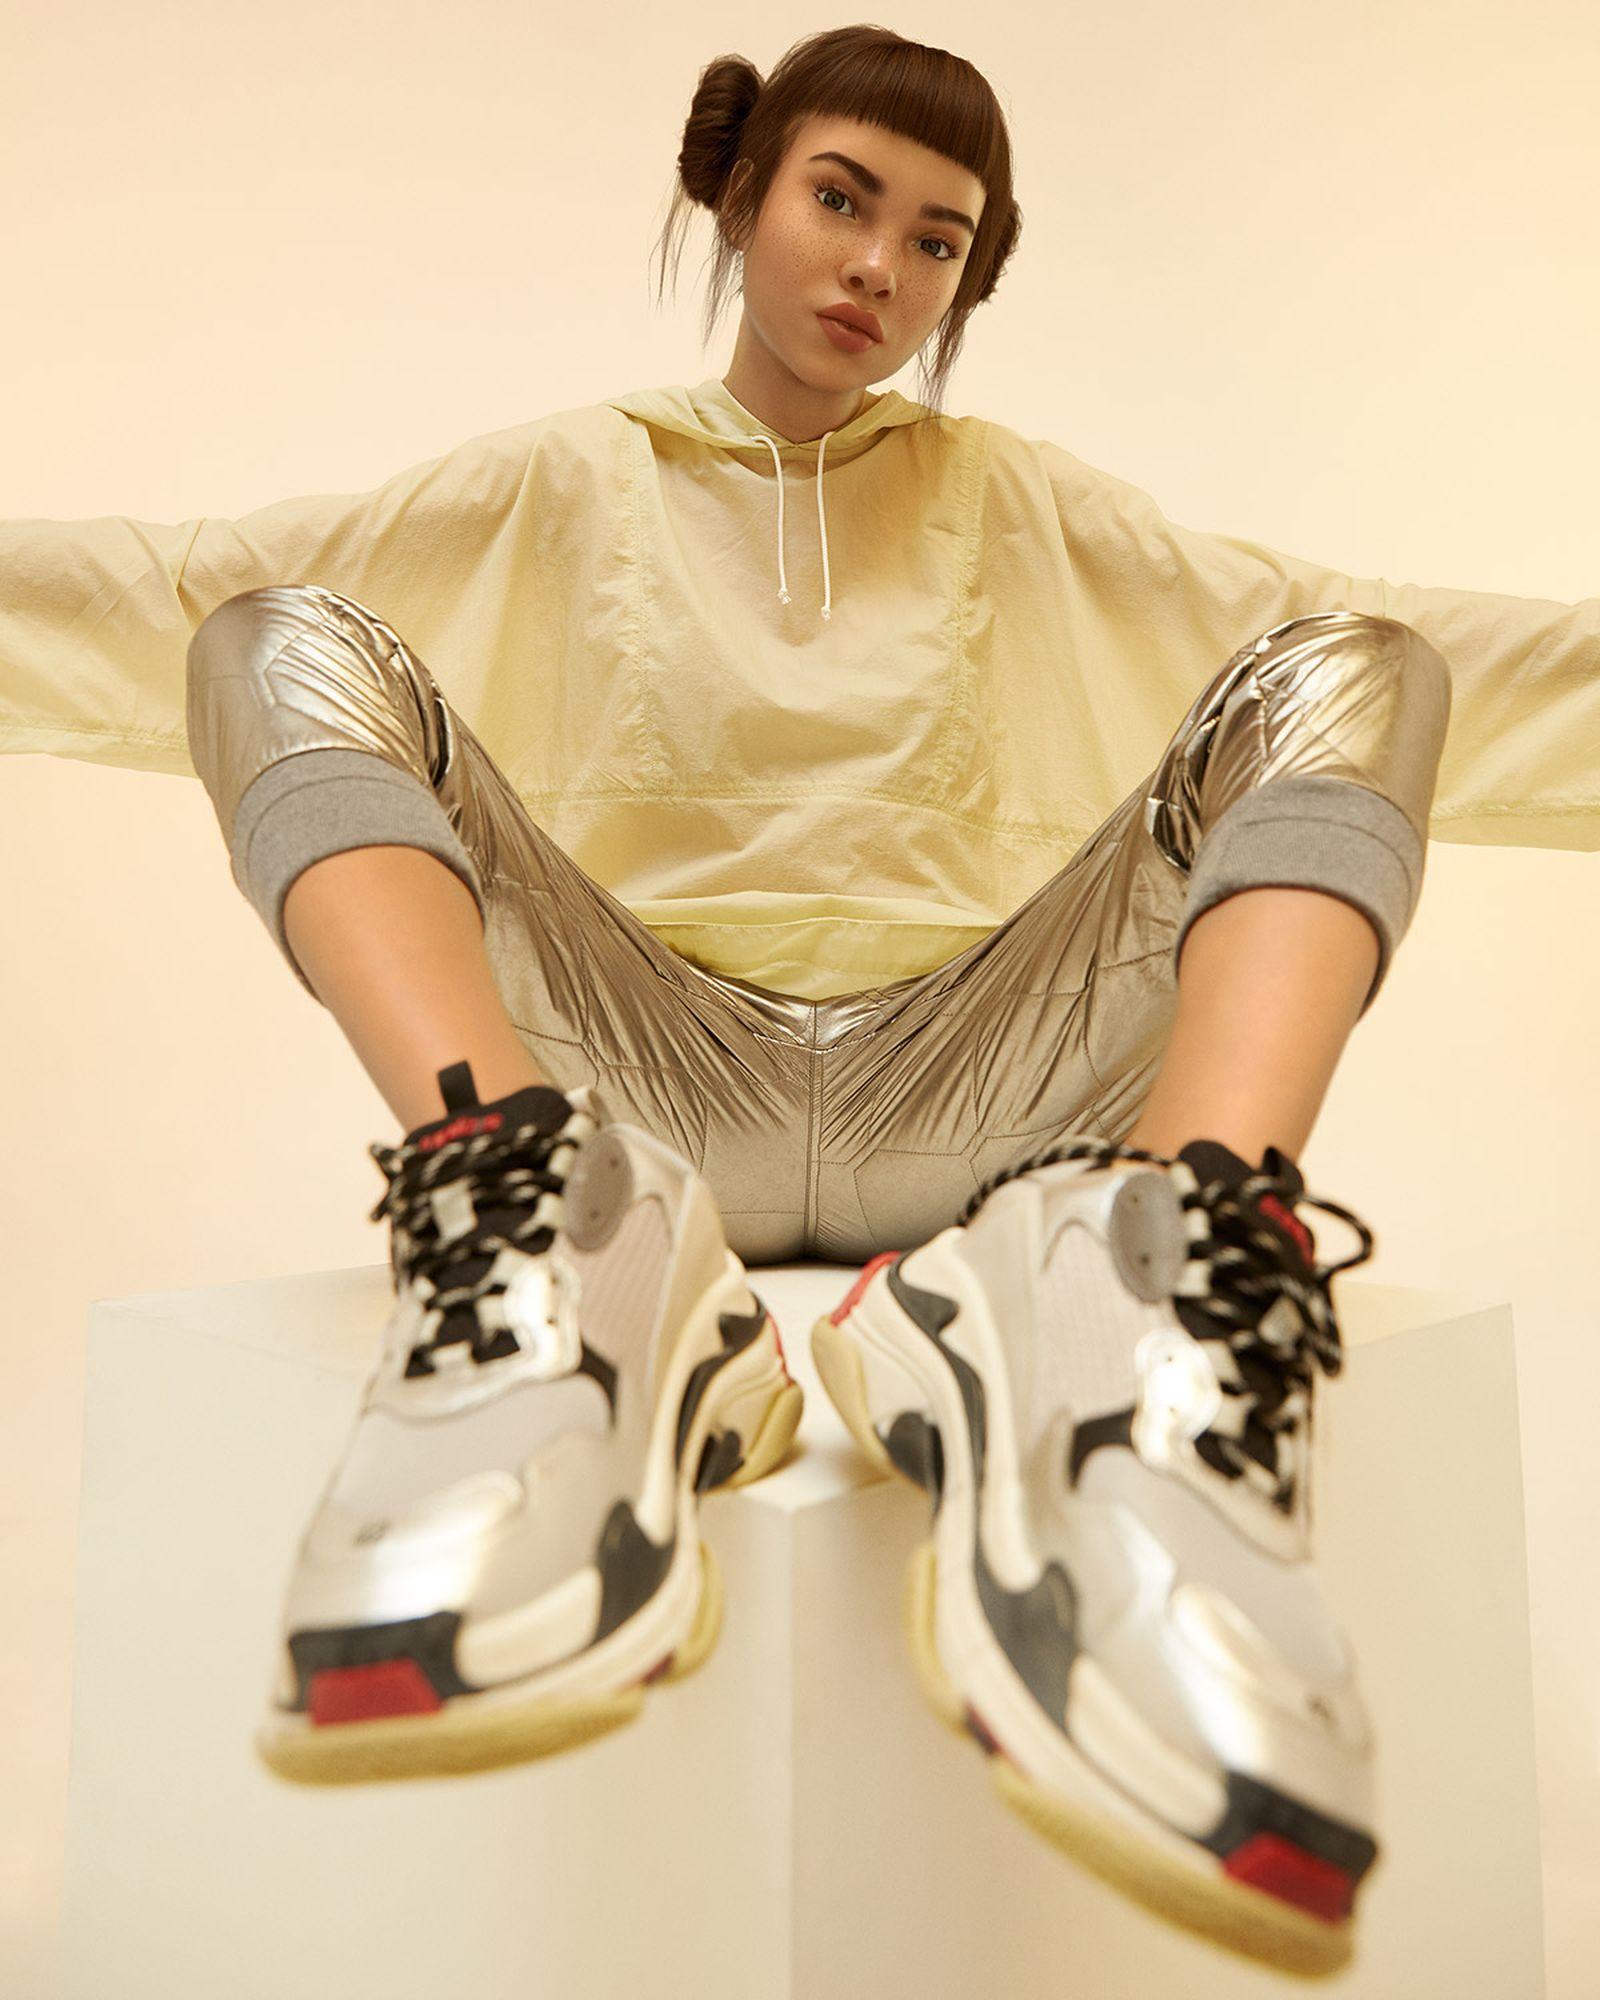 Jacket - OUR LEGACY, Pants - MONCLER, Sneakers - BALENCIAGA.